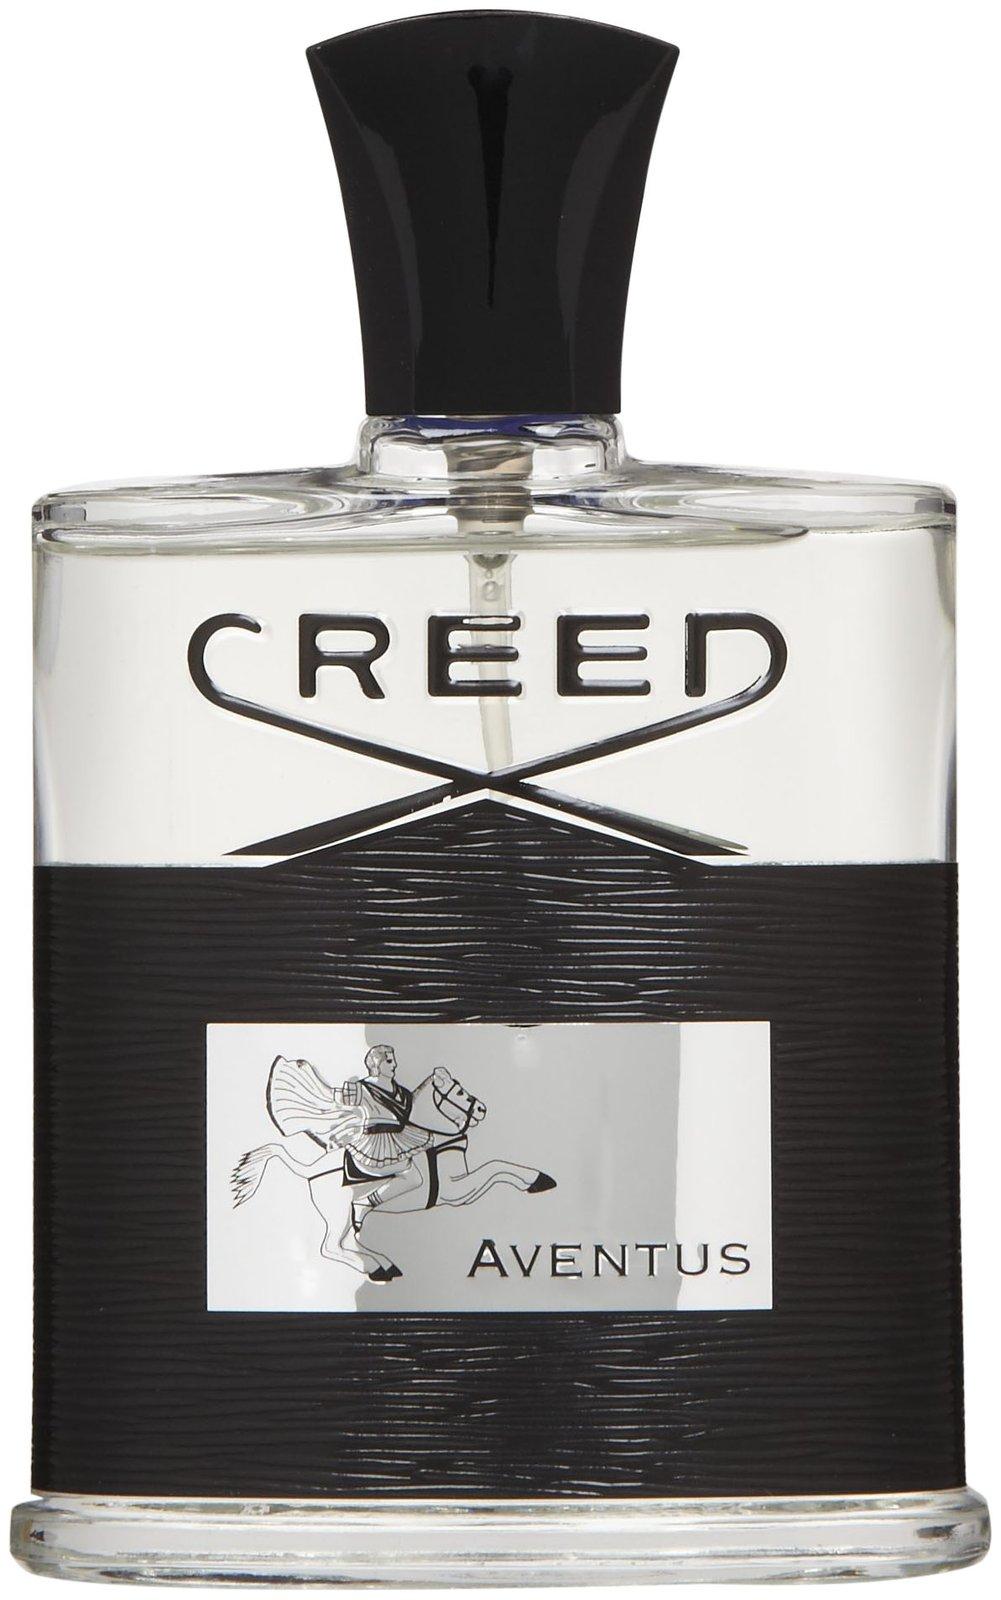 Creed 'Aventus' Fragrance, $190-$380